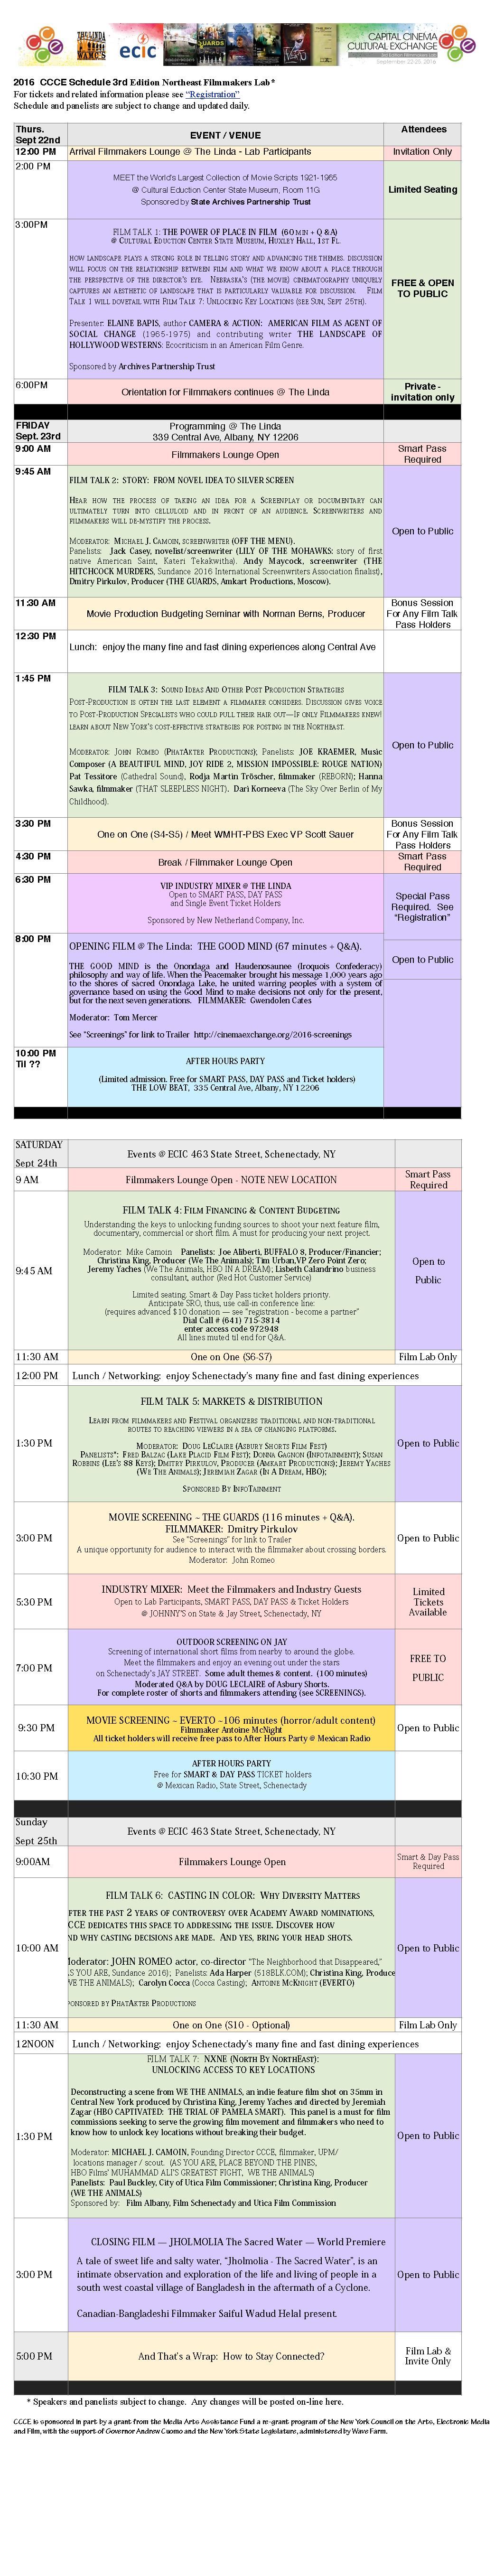 2016 3rd Edition Schedule